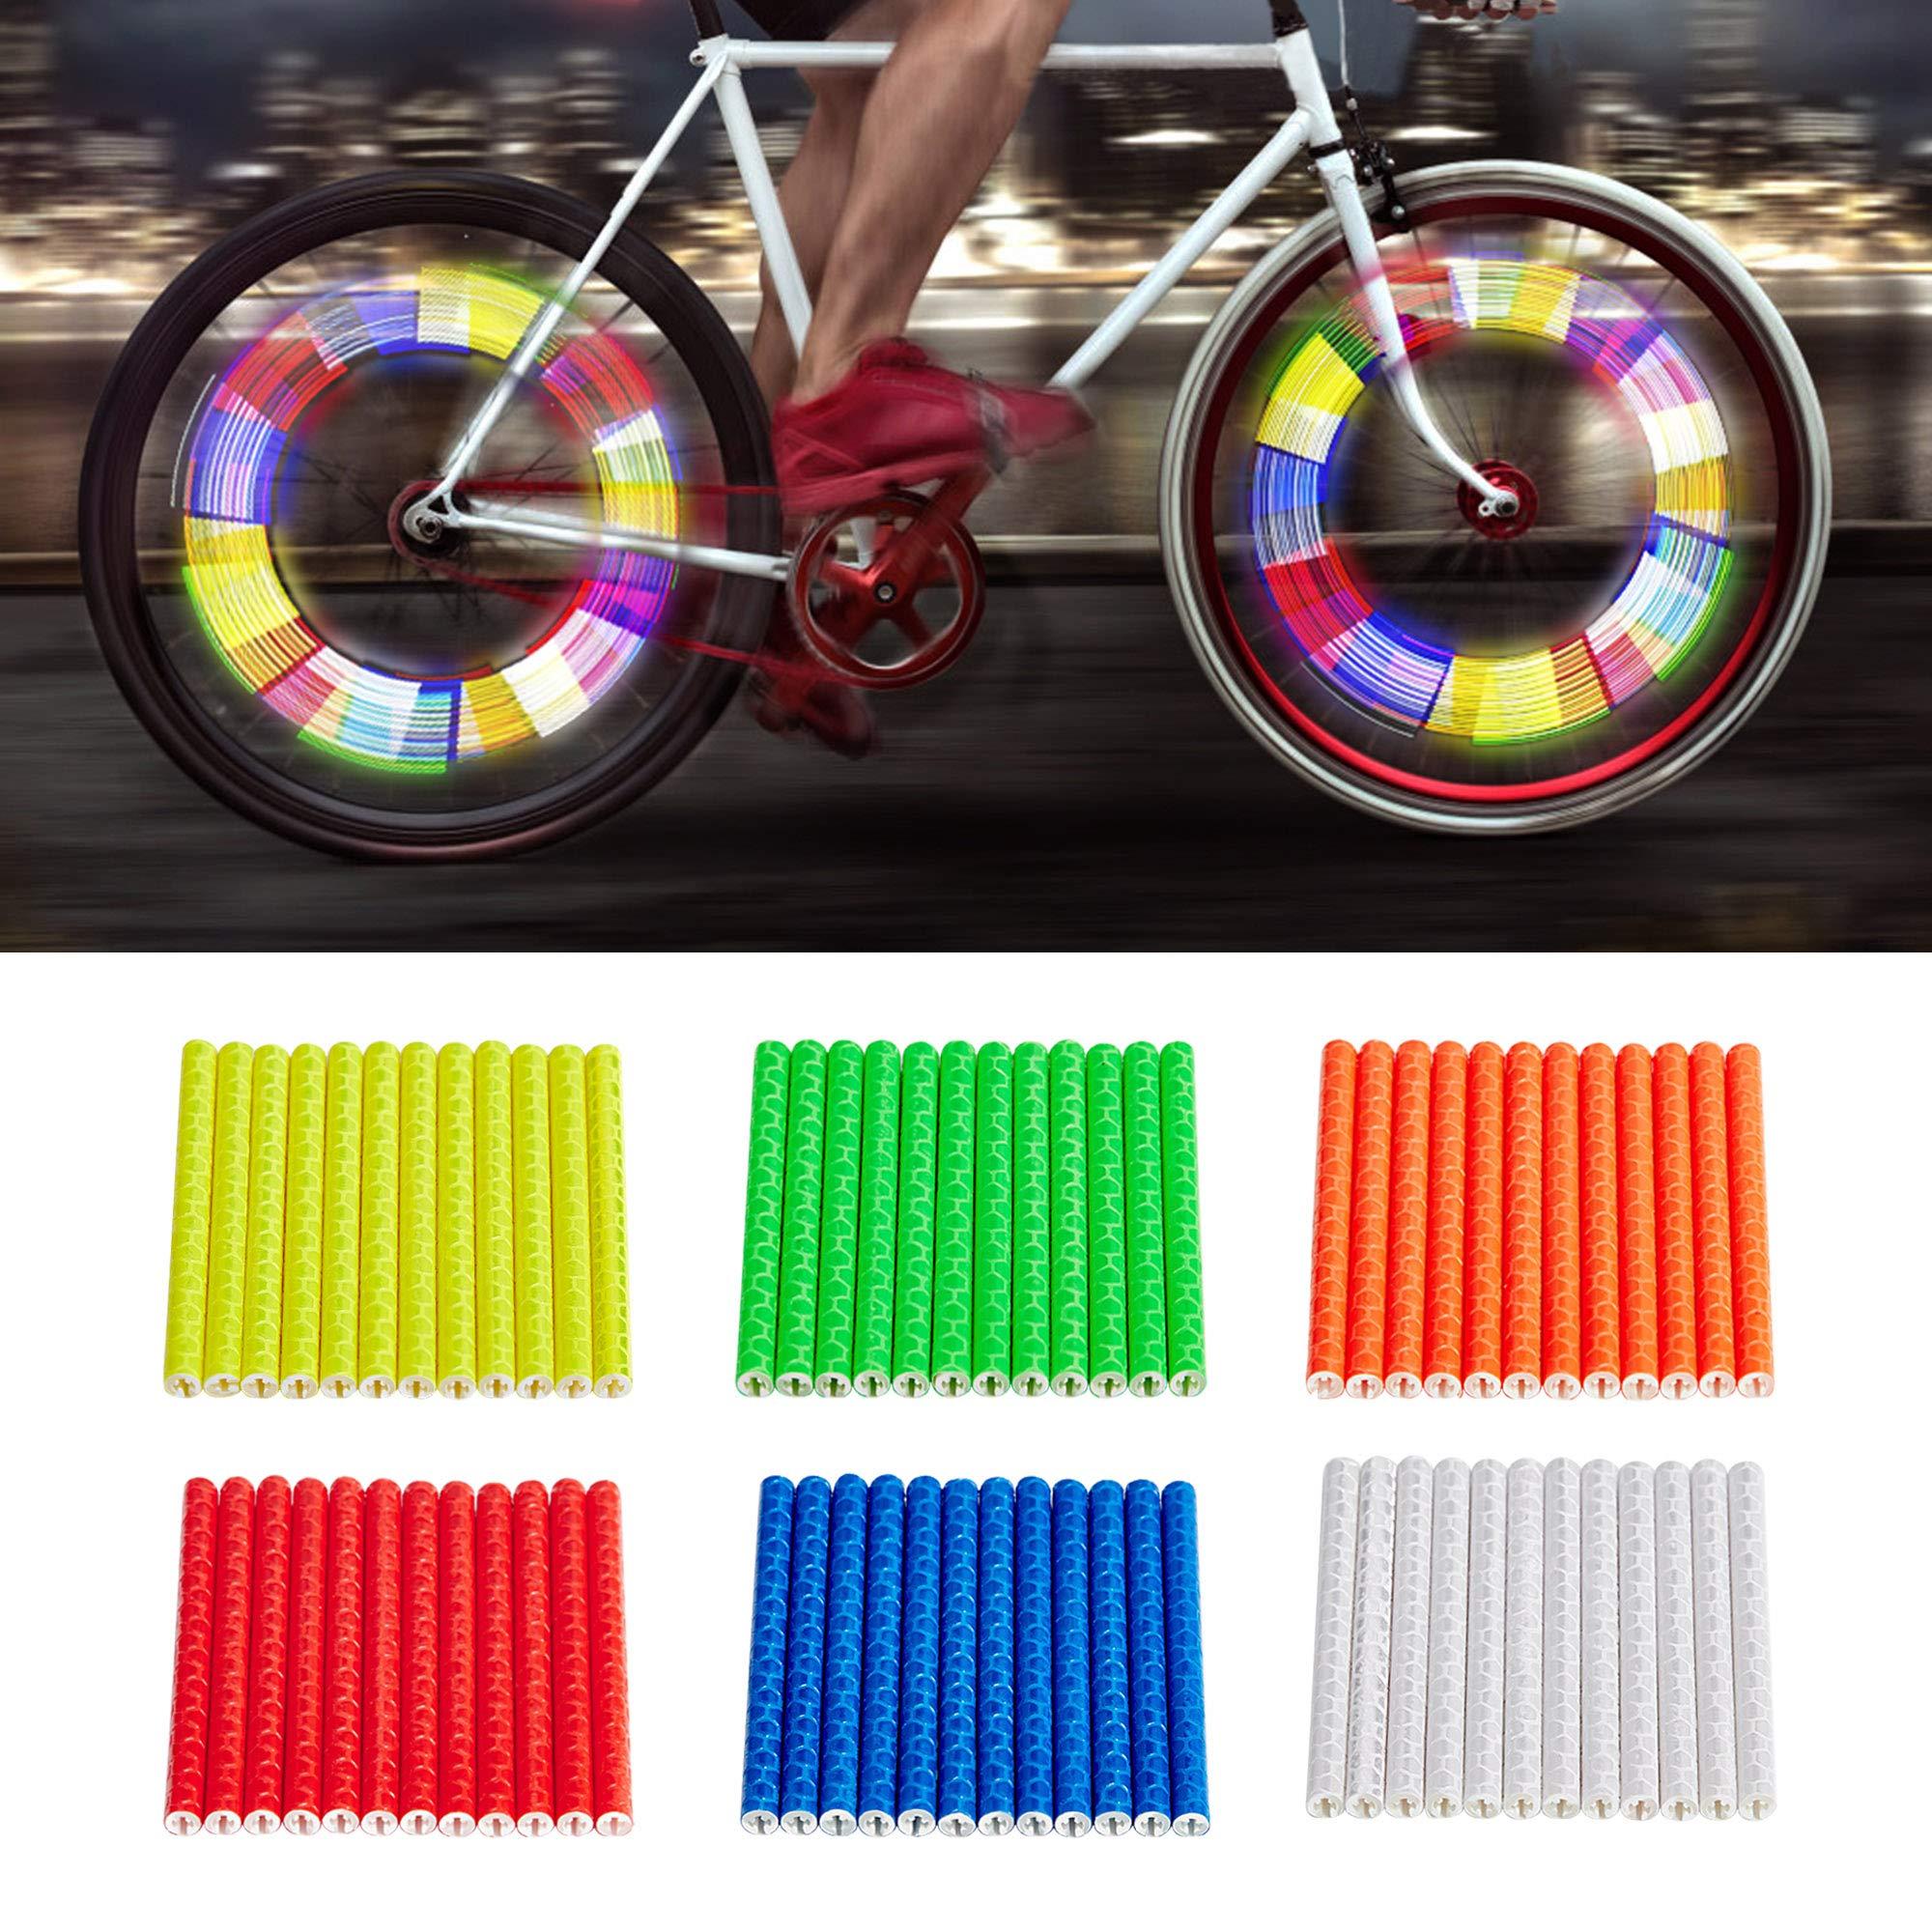 12 Bicycle Spoke Reflectors Bike Wheel Clipon Reflective Tubes Cycling Reflector